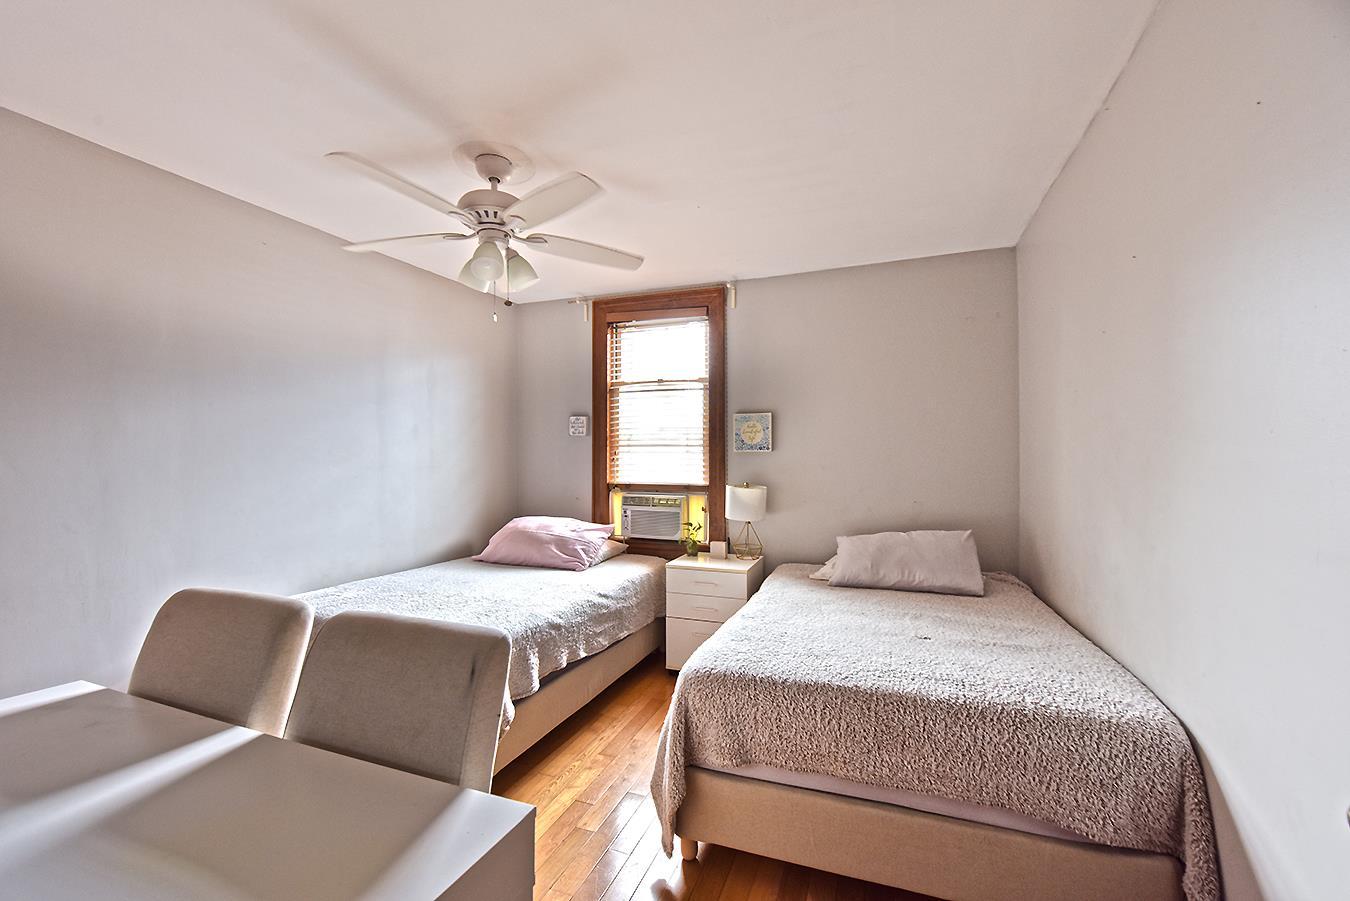 11 Van Corlear Place Marble Hill Bronx NY 10463